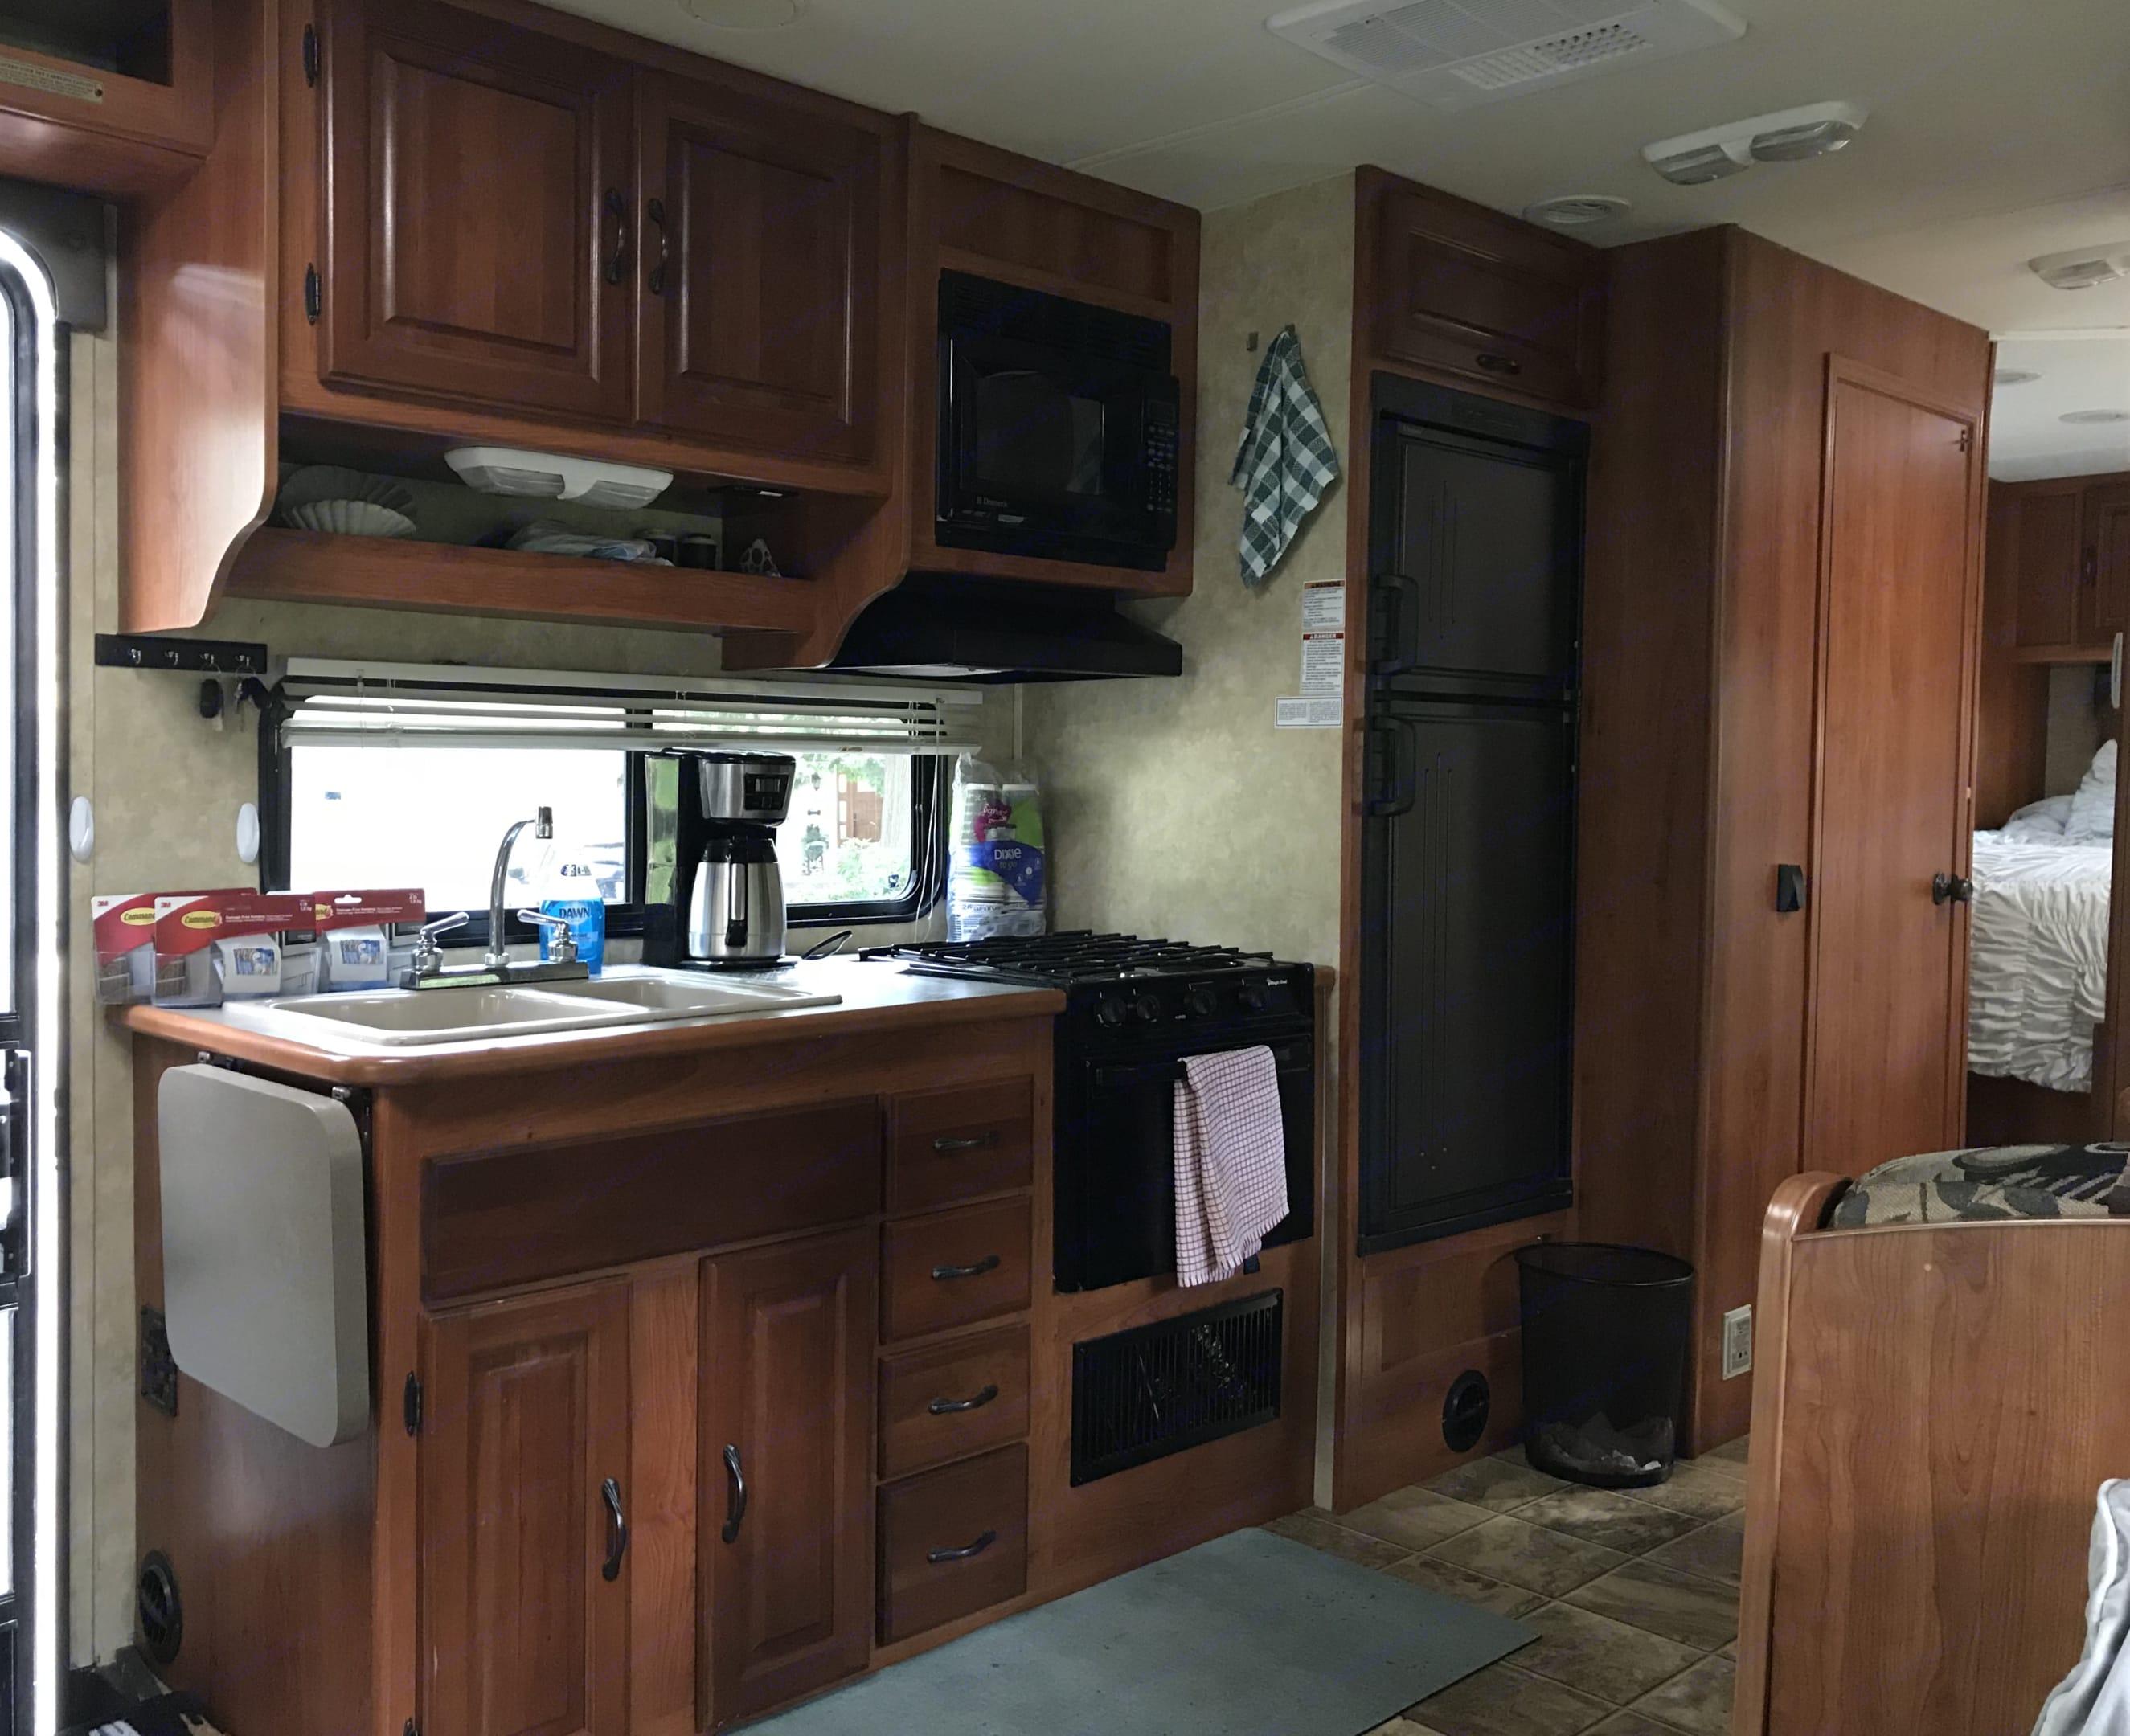 Full loaded kitchen w/ Coffee Pot. Ford Coachmen 2008